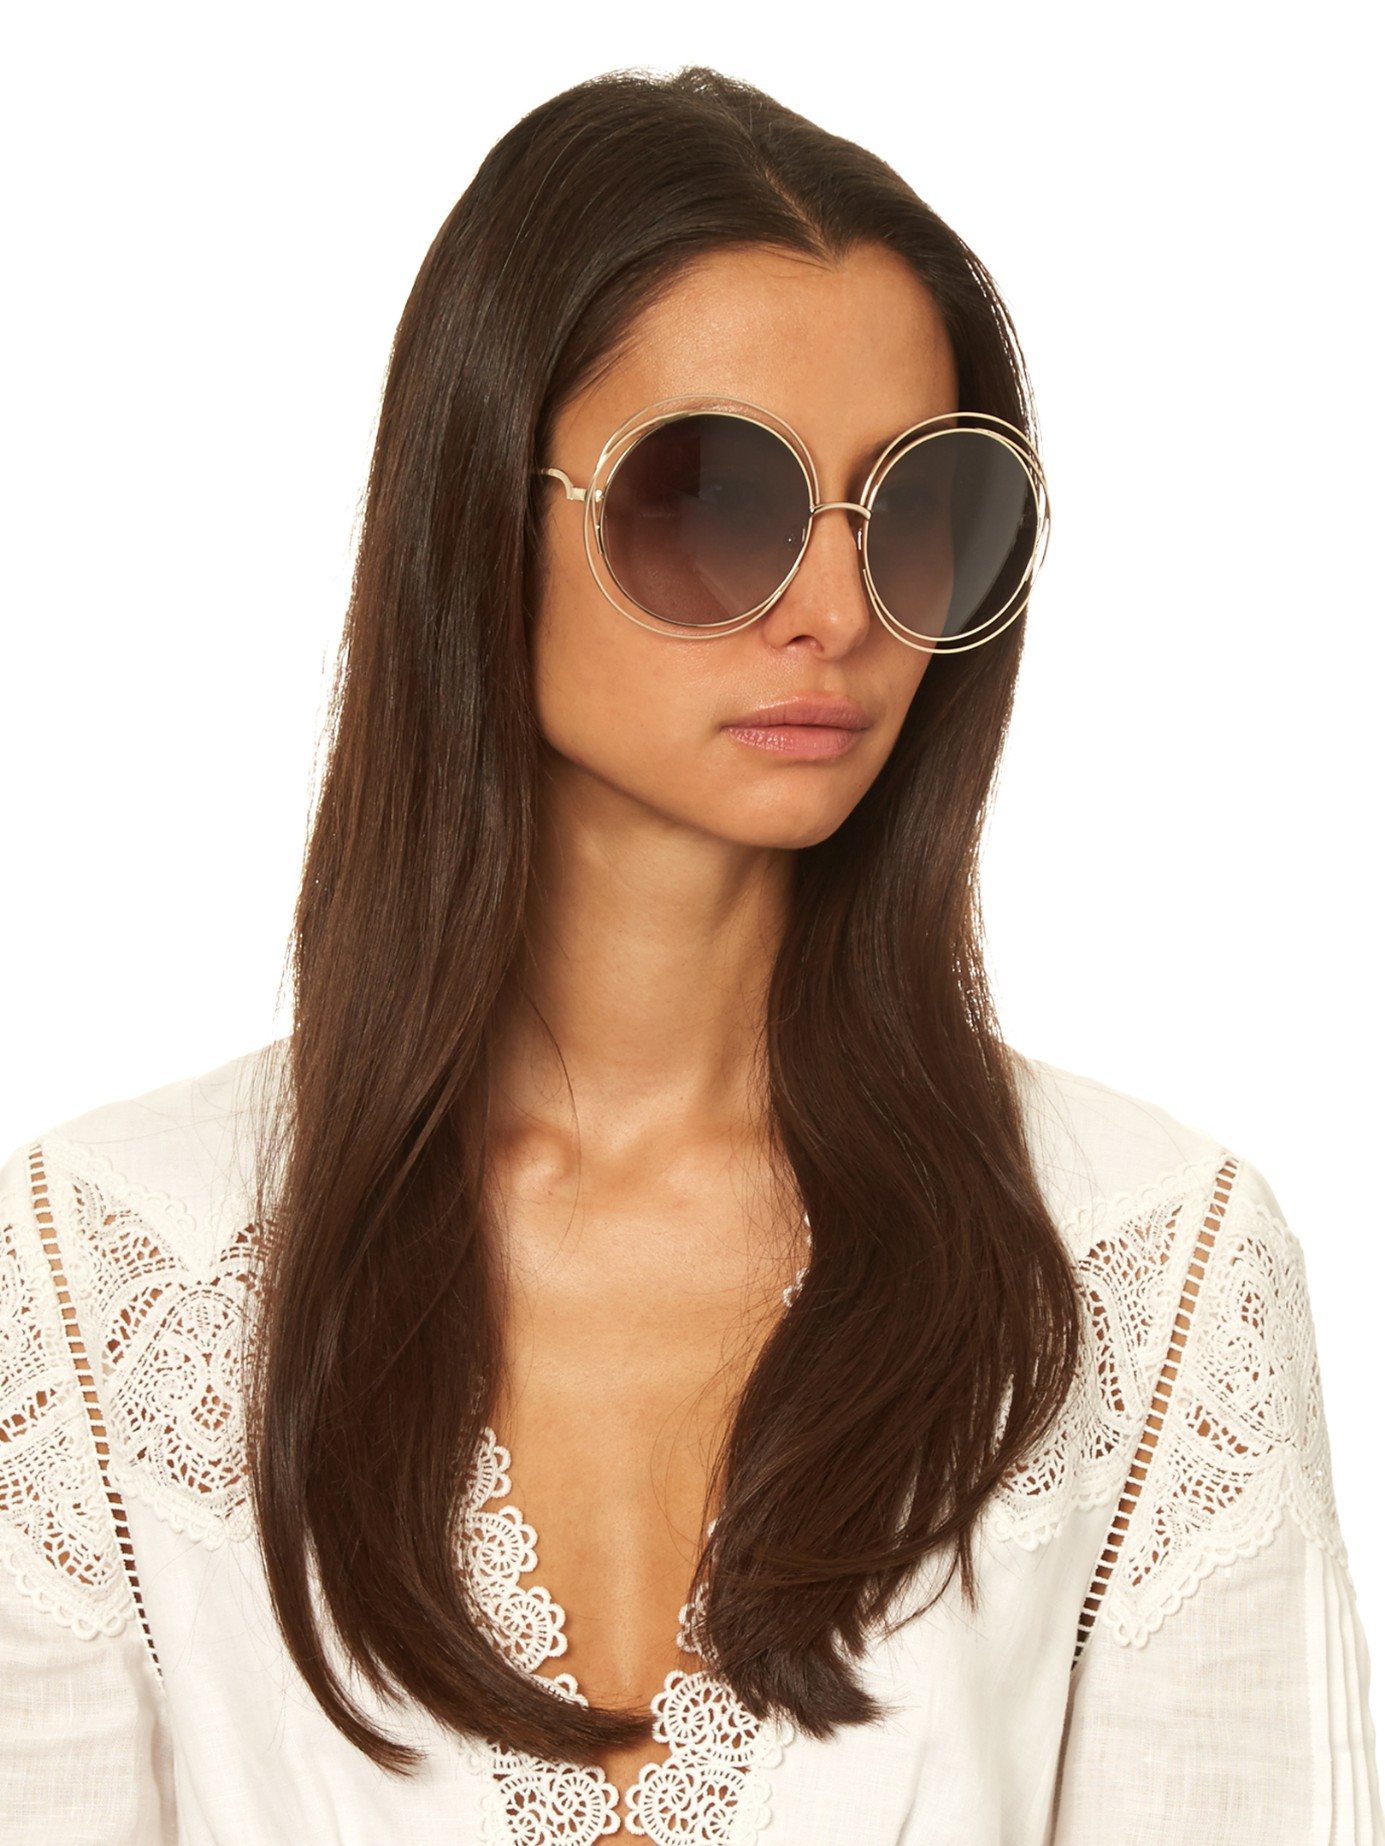 772d848812b Chloé Carlina Round-framed Sunglasses in Metallic - Lyst